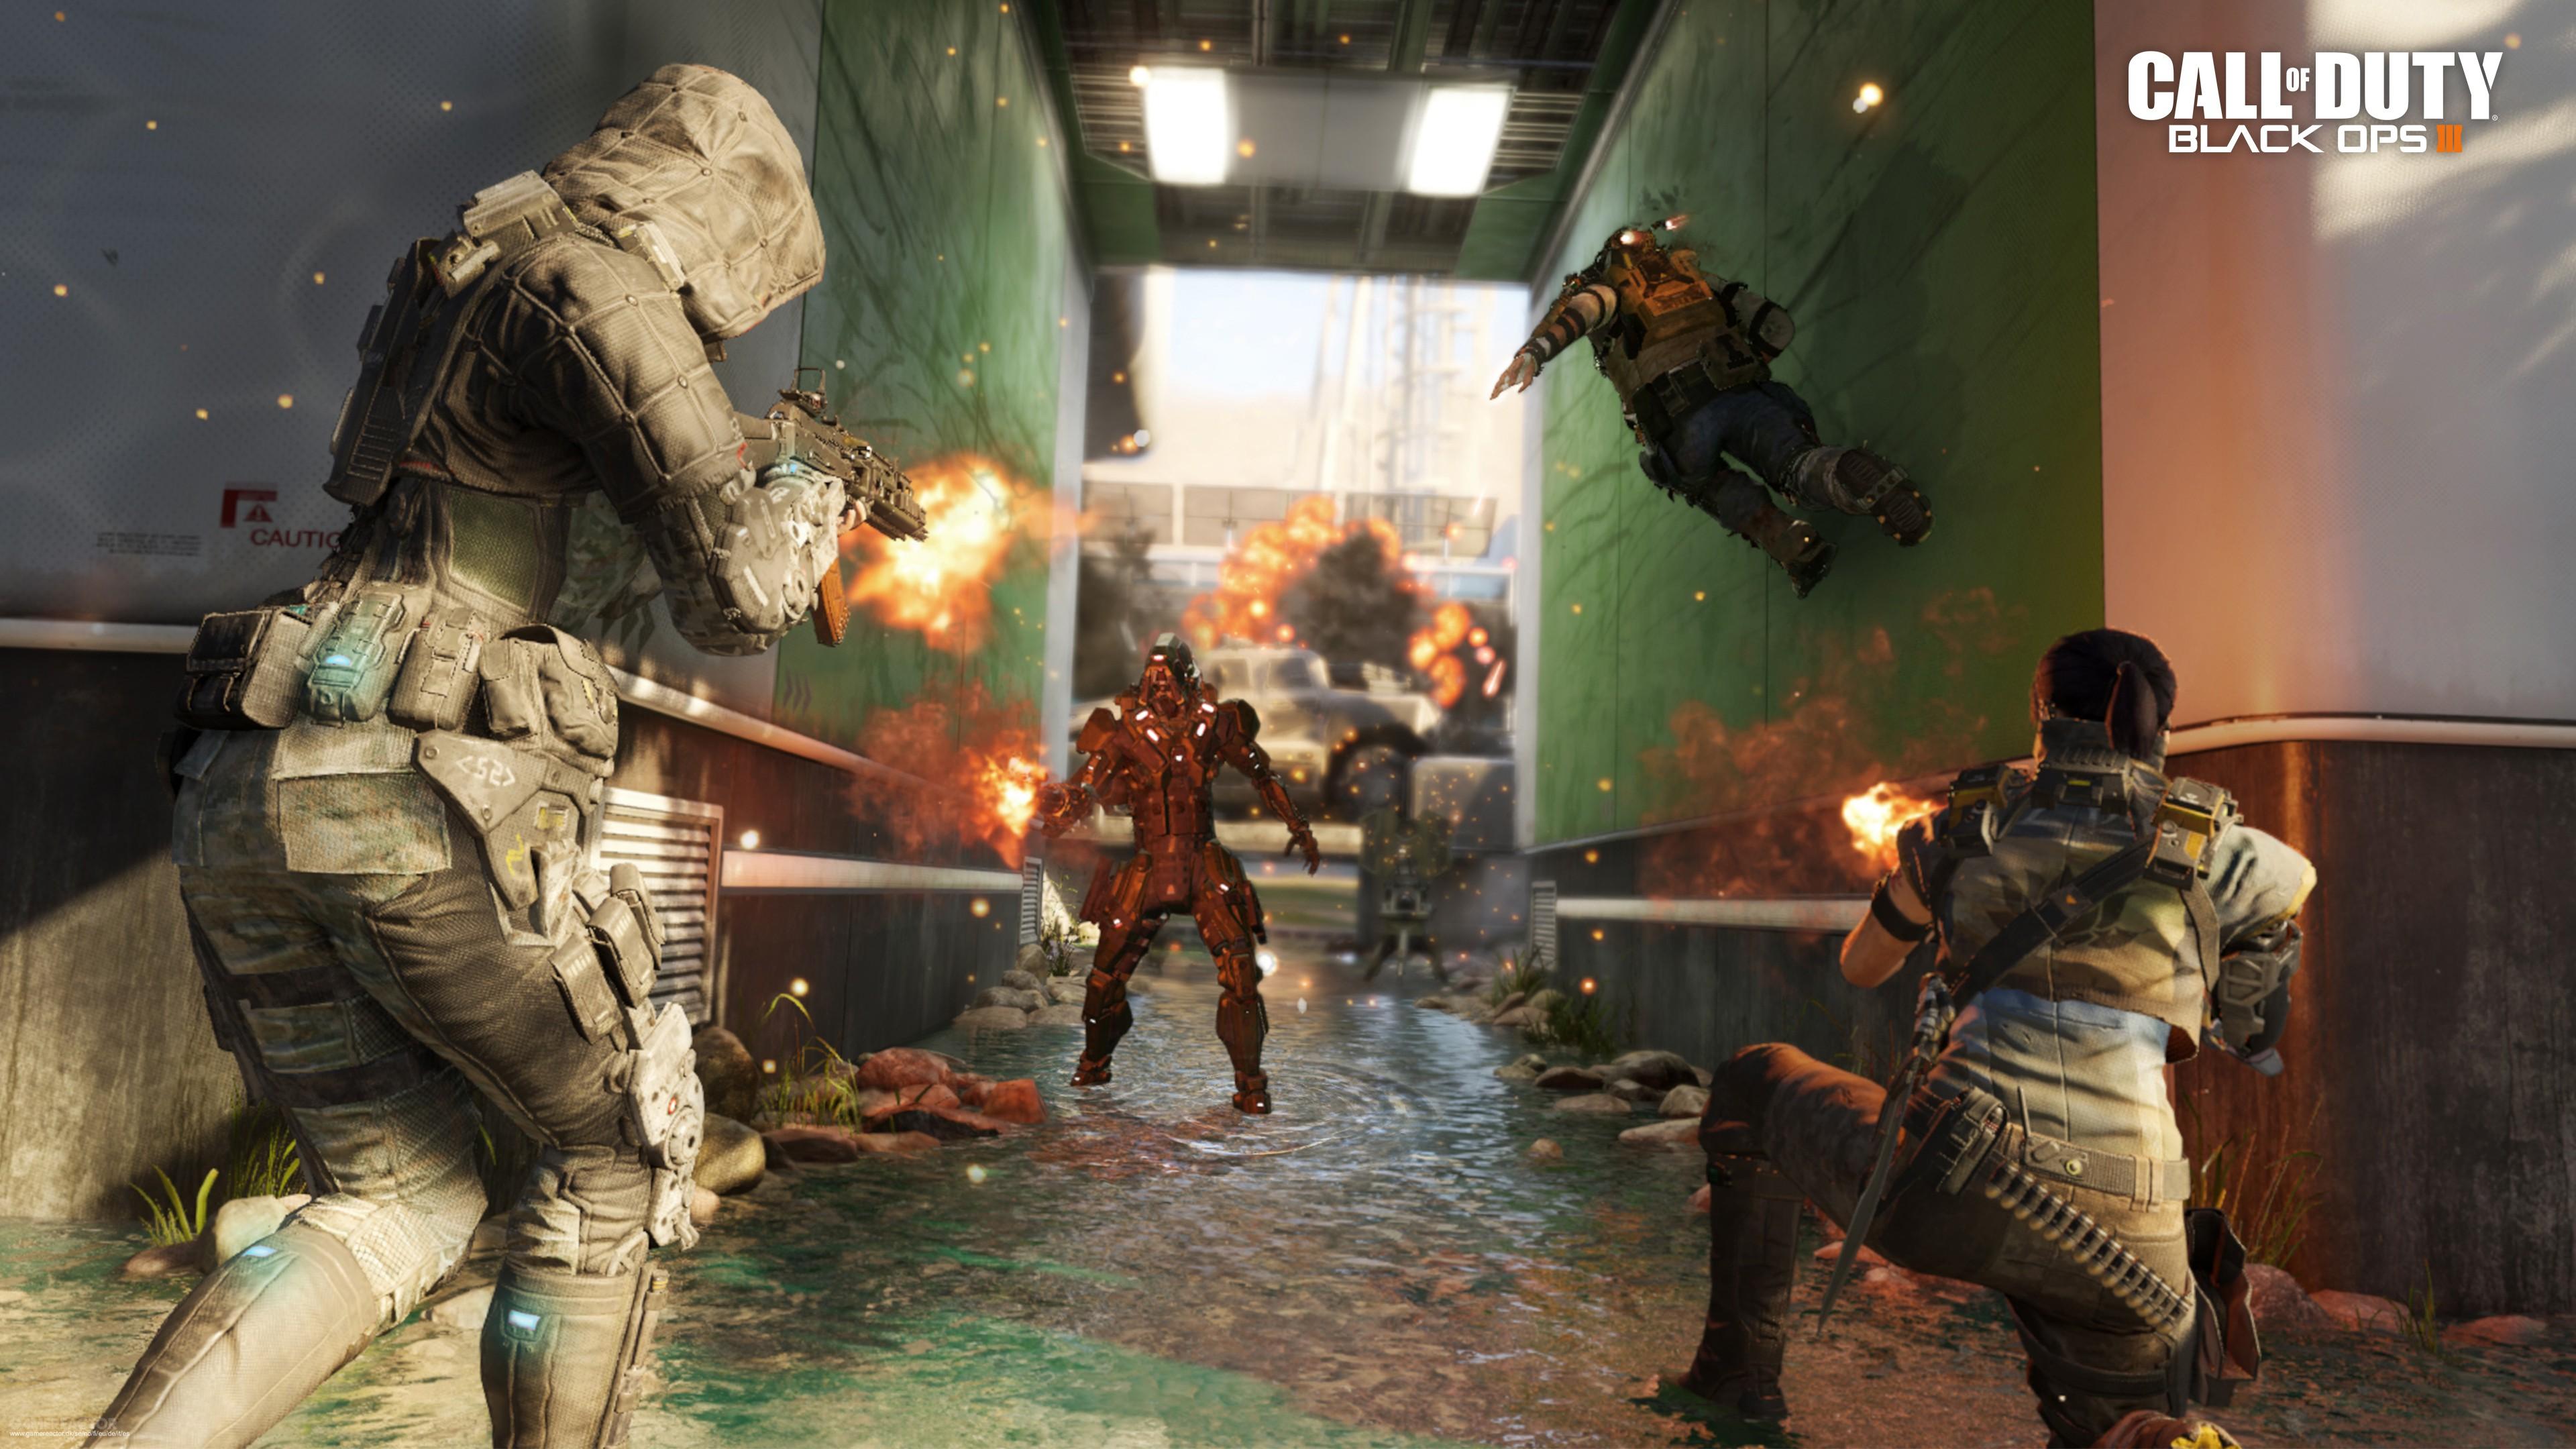 Call of Duty: Black Ops 3 descarga un parche de 2,7 GB